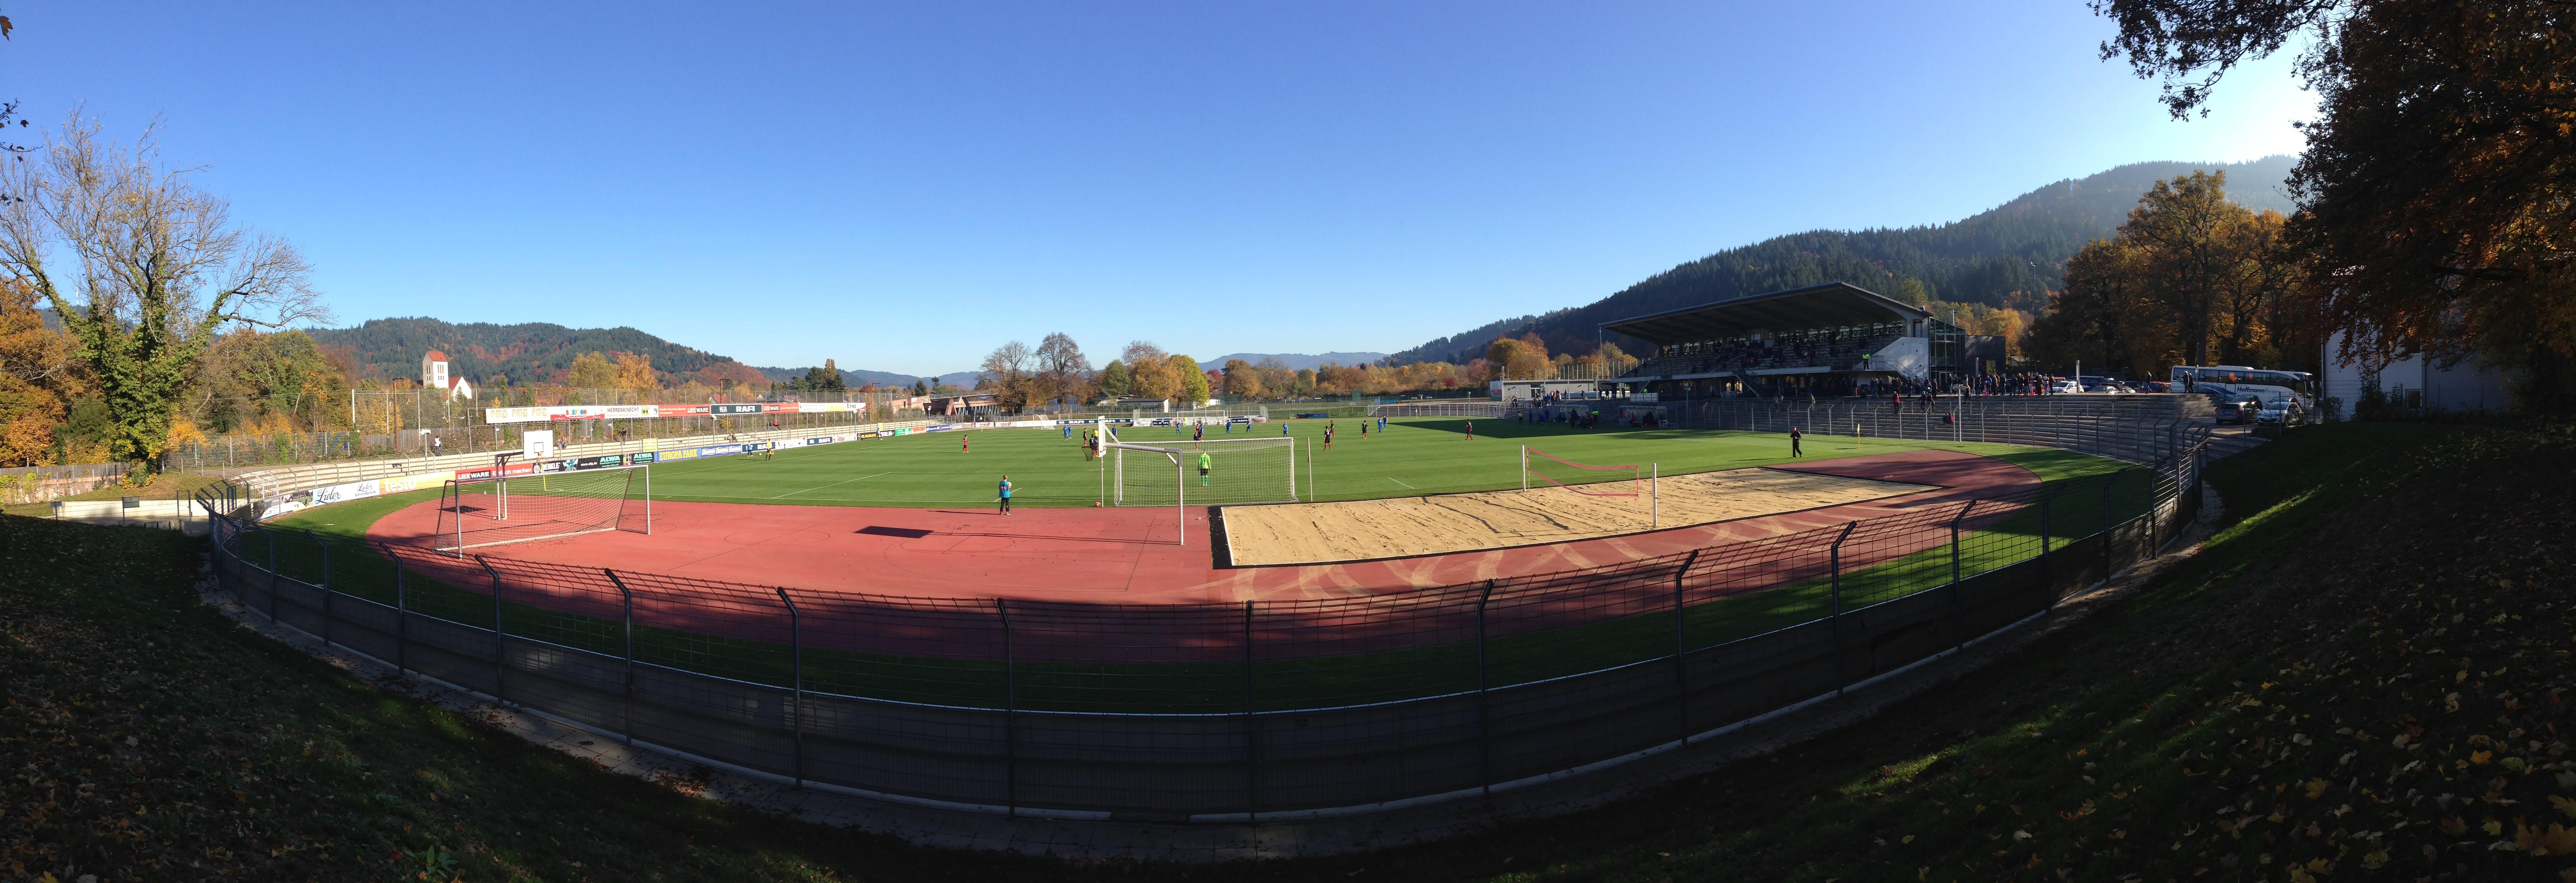 Panorama Möslestadion